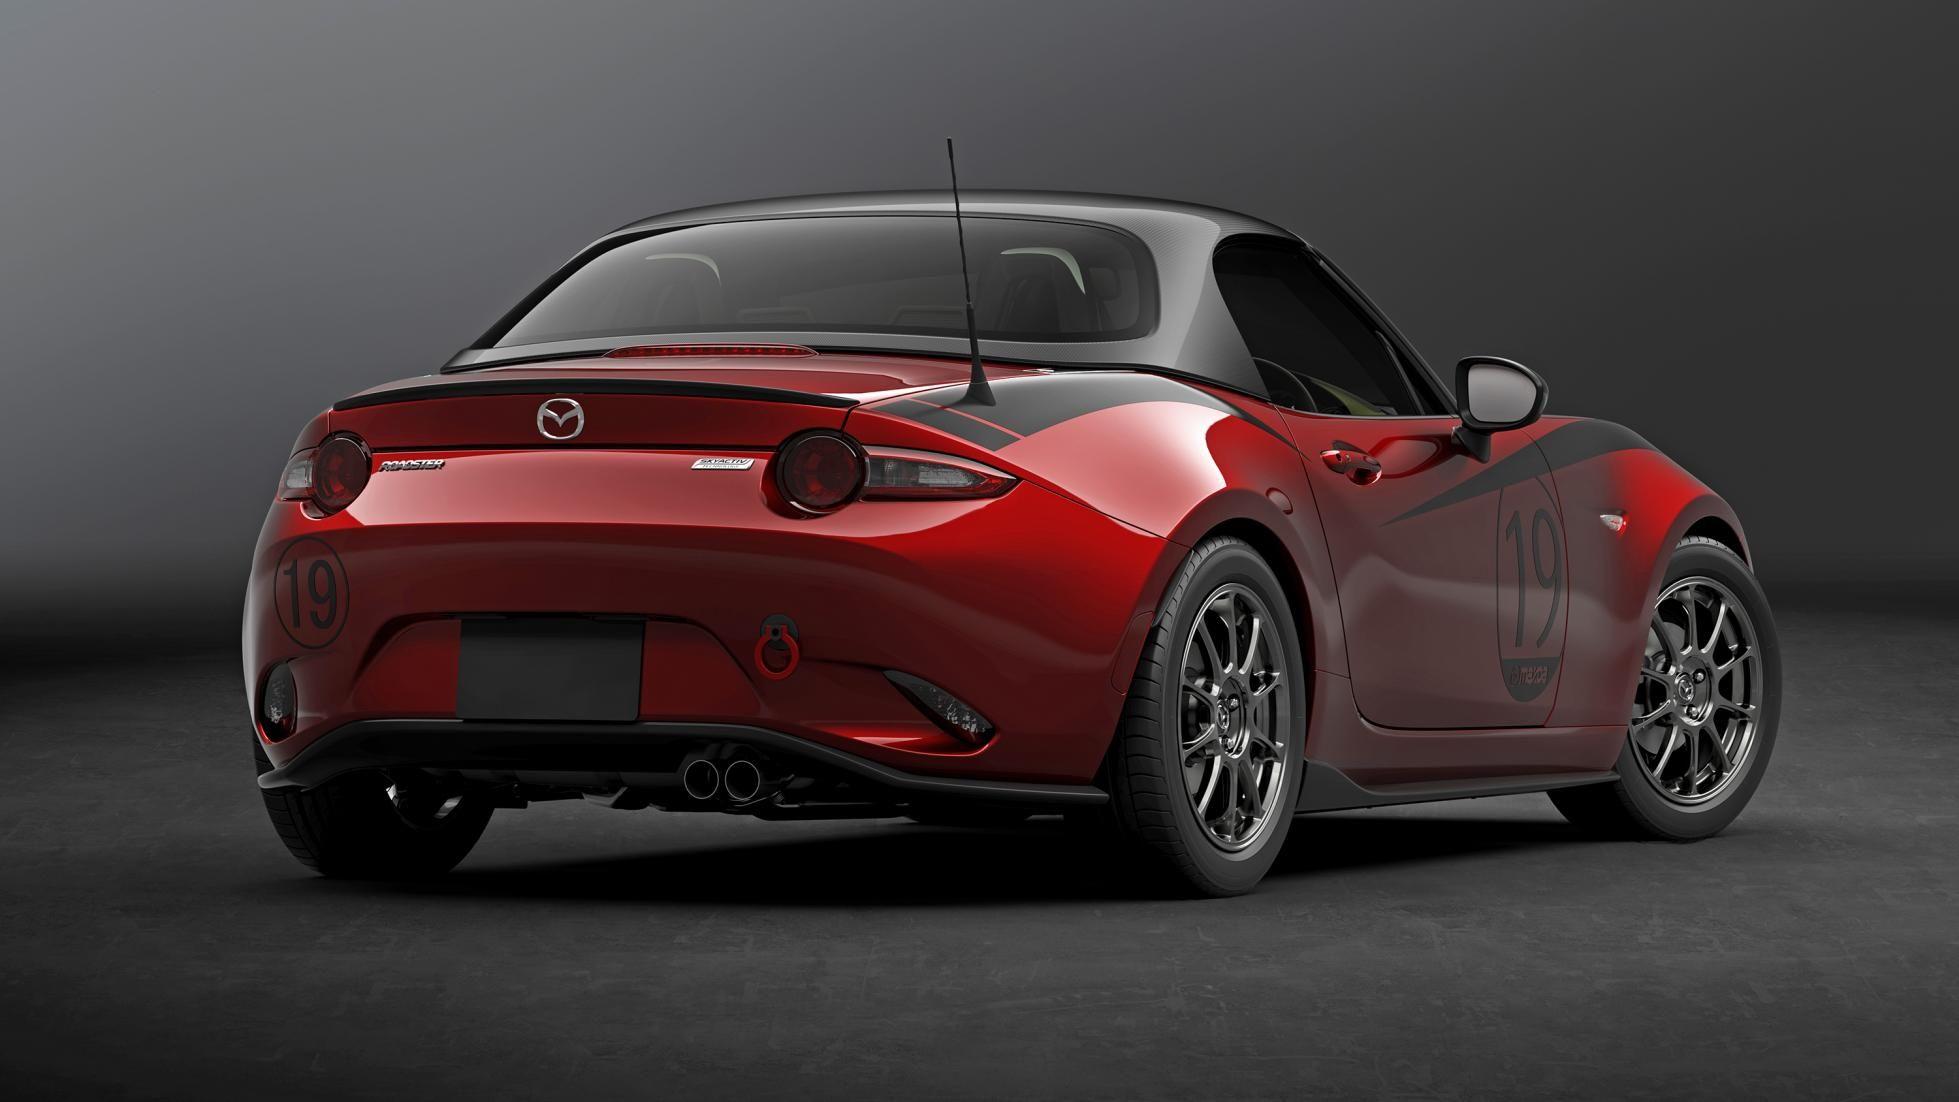 Meet The Carbon Clad Mazda Mx 5 Drop Head Coupe Mazda Miata